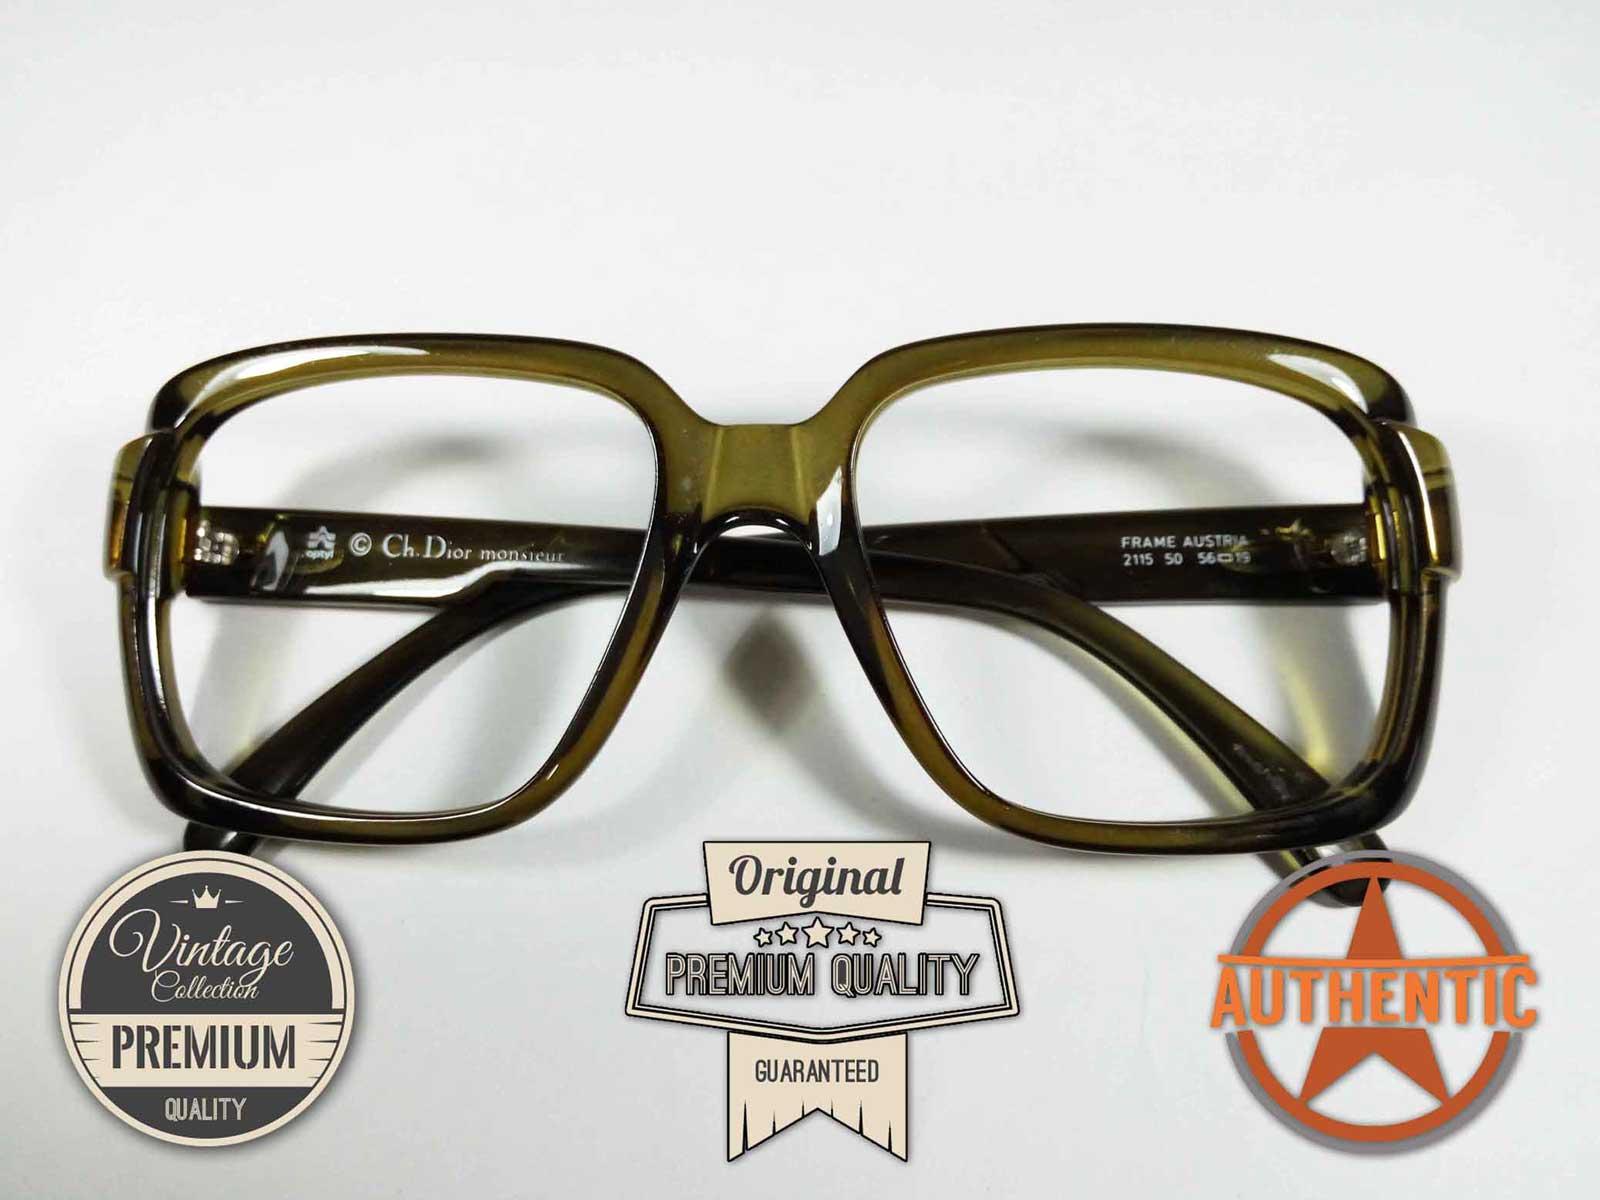 Kacamata Vintage SQUARE KOTAK Jadul Antik Classic Original CHRISTIAN DIOR  MONSIEUR 2116 GREEN 122feadc74